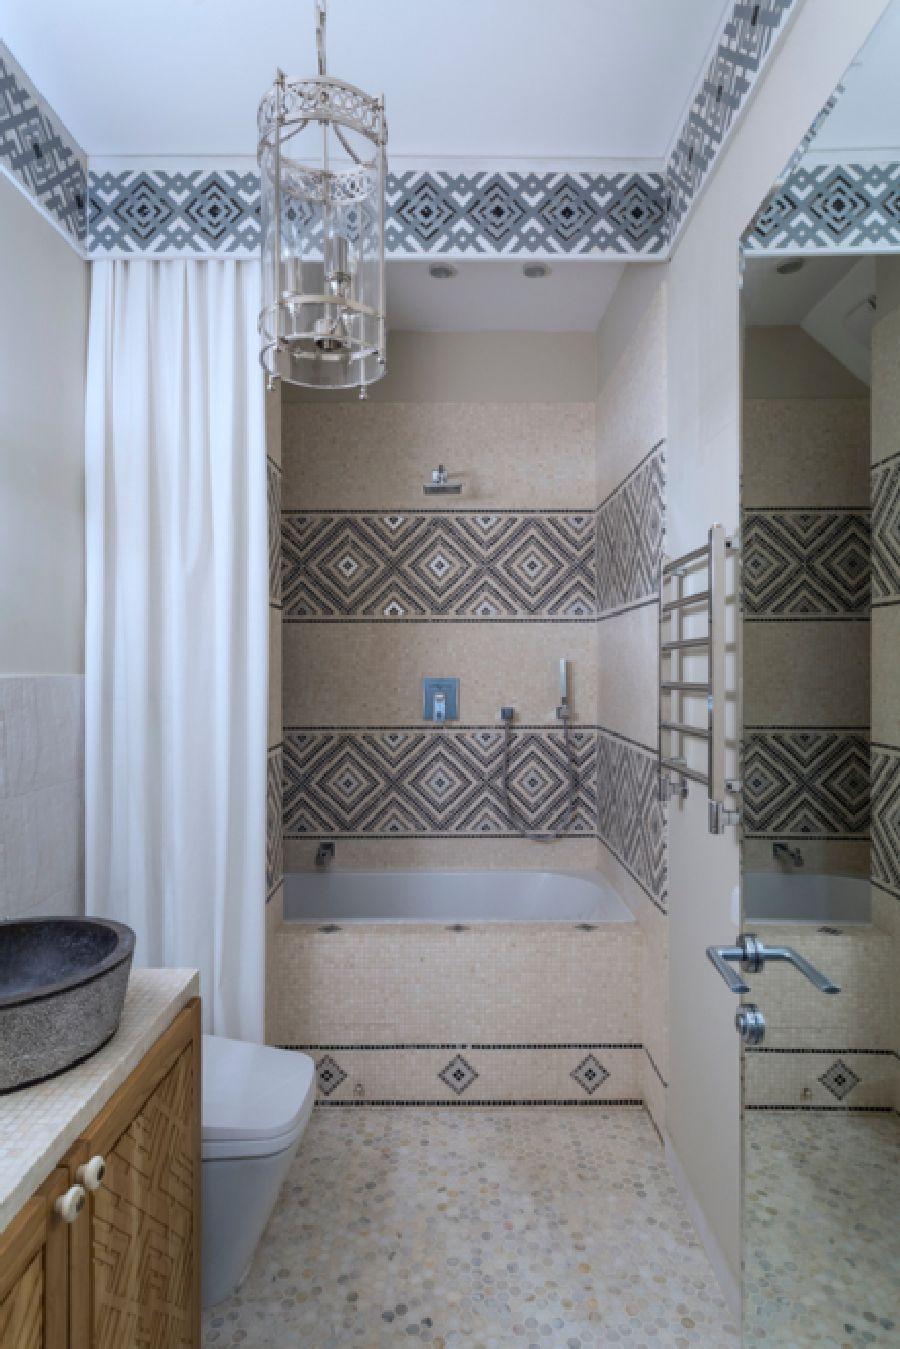 adelaparvu.com despre apartament de 80 mp patrati cu aer rustic elegant, locuinta Rusia, designer Zhenya Zhdanova (23)